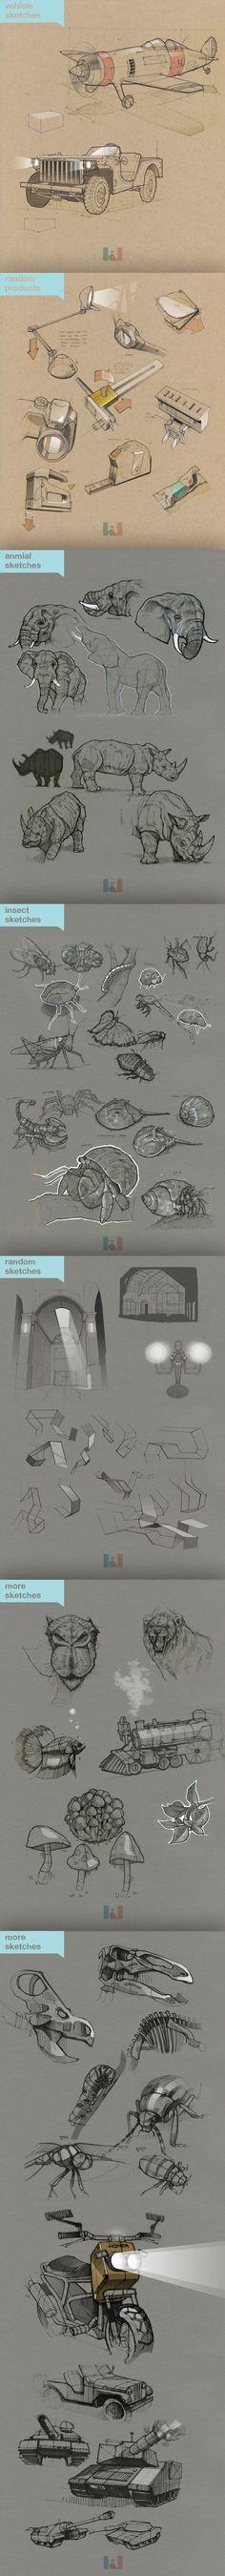 KidongKwon - awesome sketches